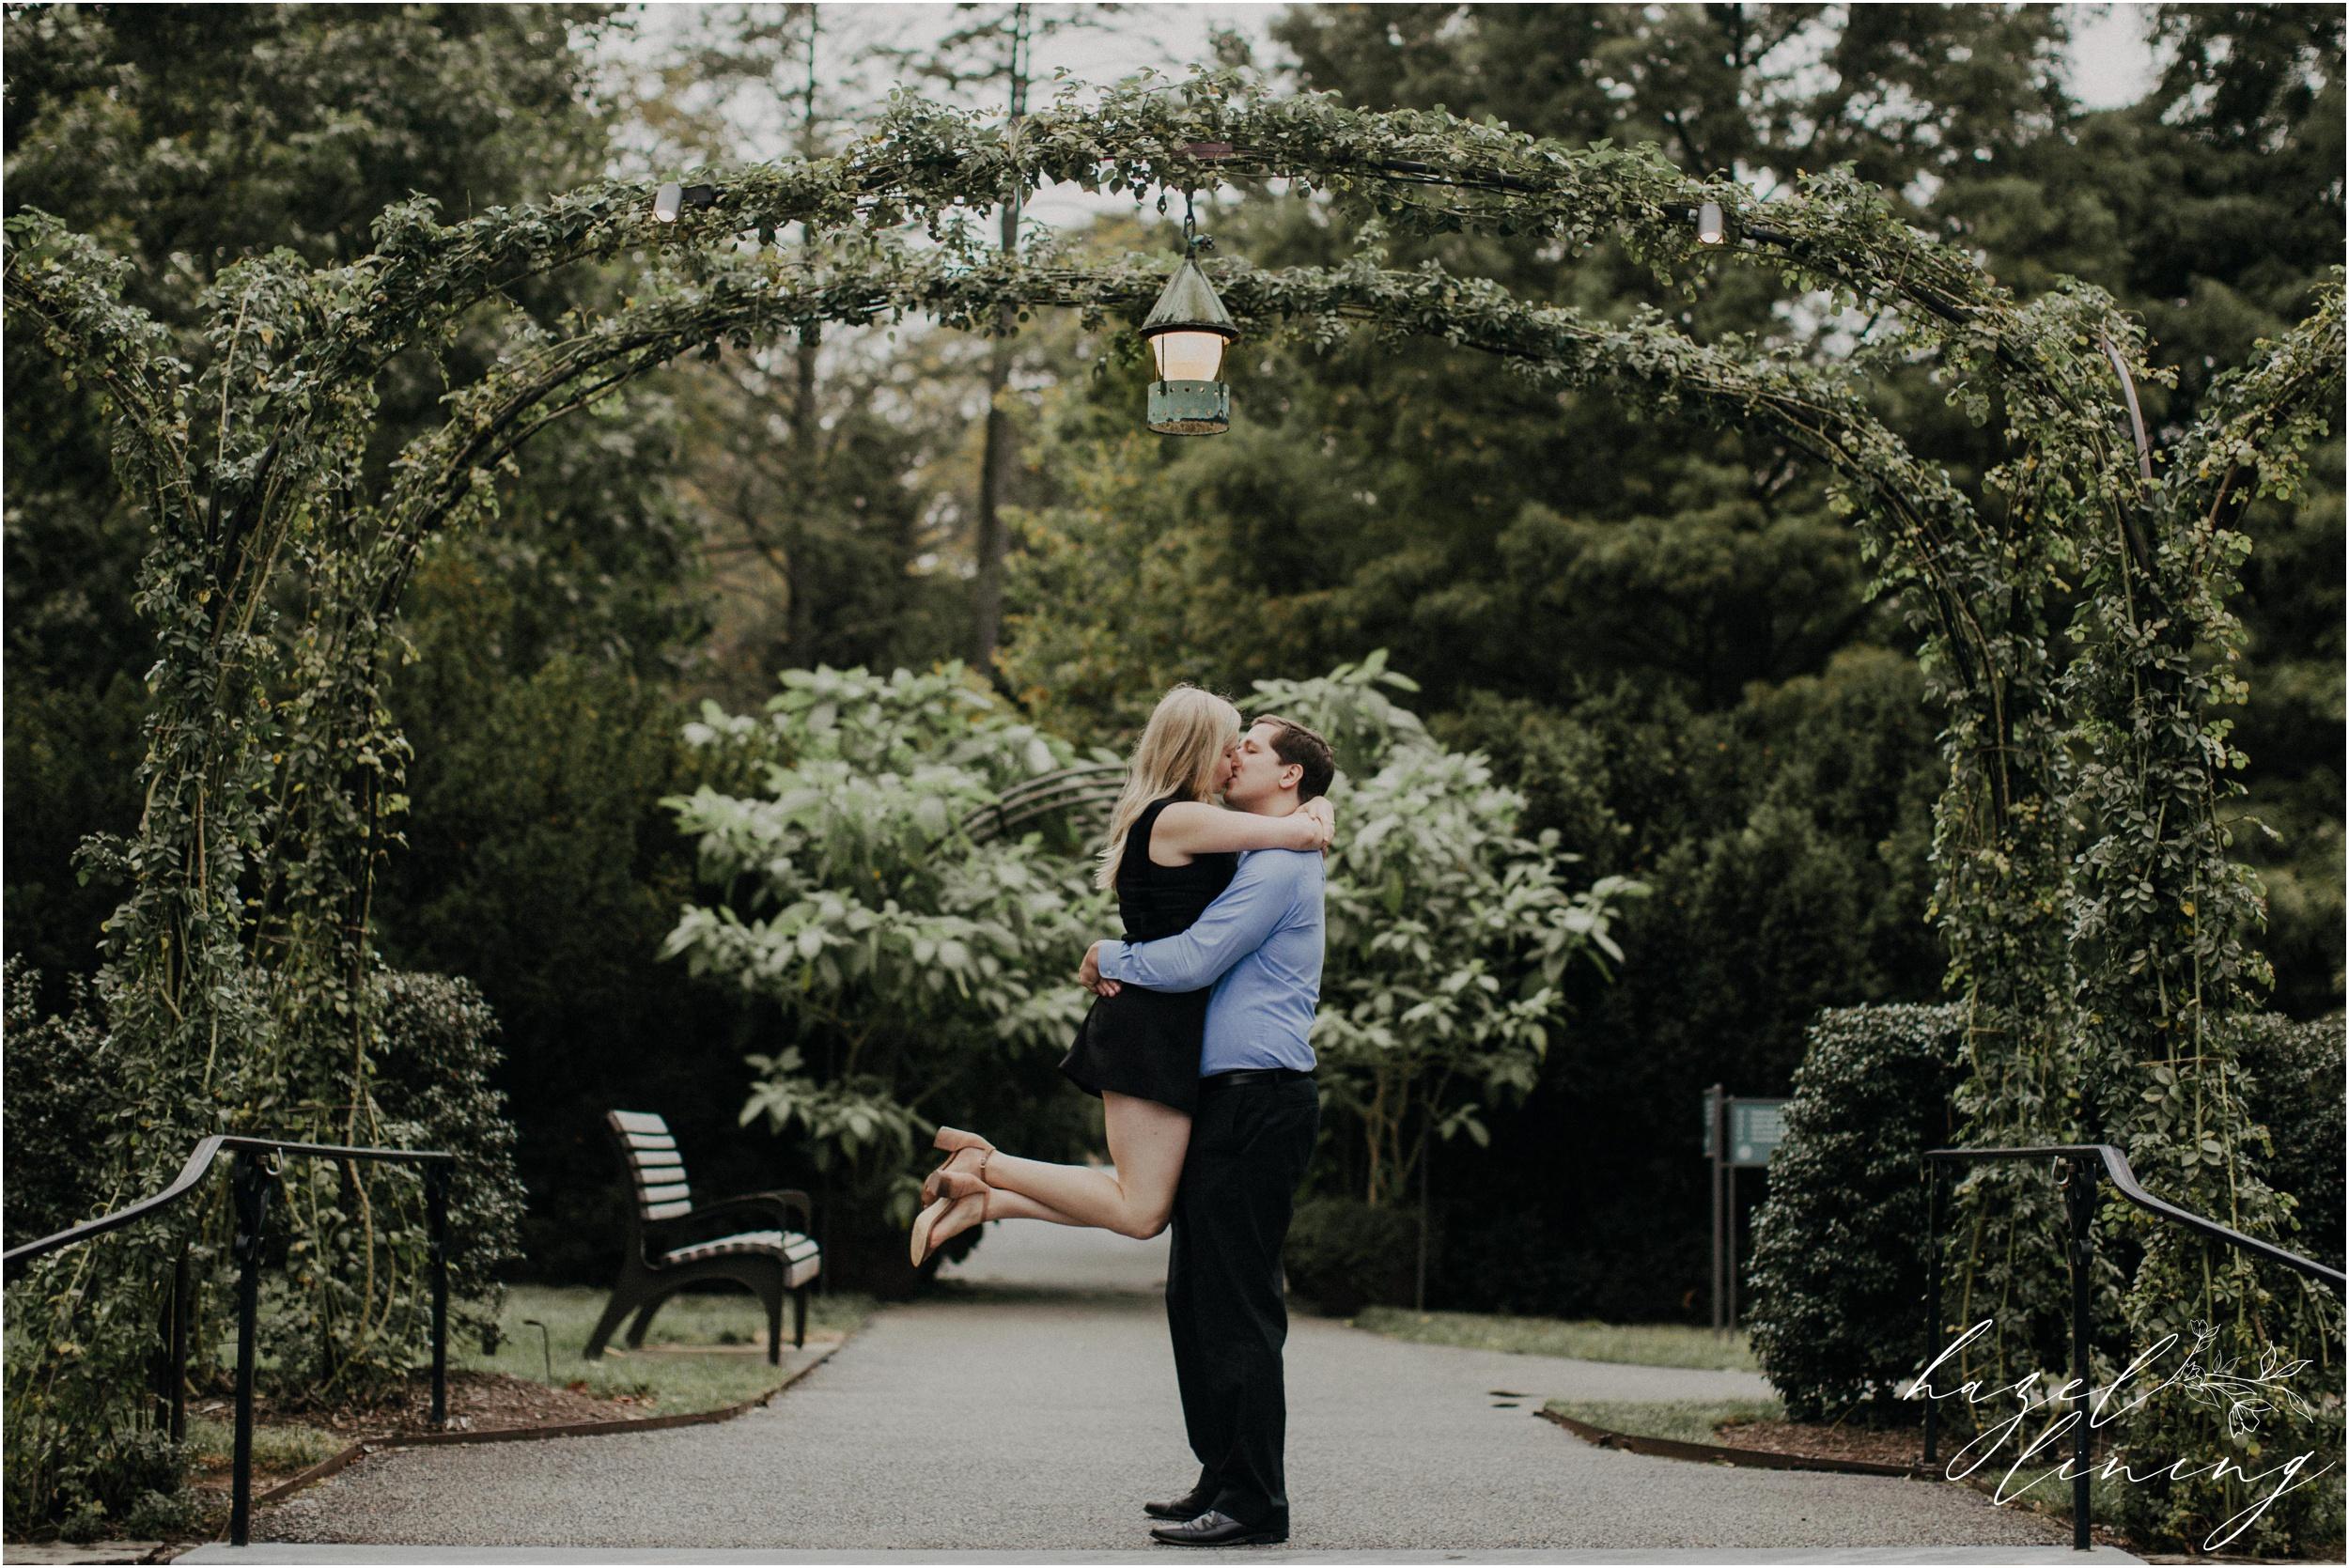 victoria-travis-logan-mayes-longwood-gardens-kennett-square-philadelphia-engagement-session-hazel-lining-photography-destination-elopement-wedding-engagement-photography_0038.jpg